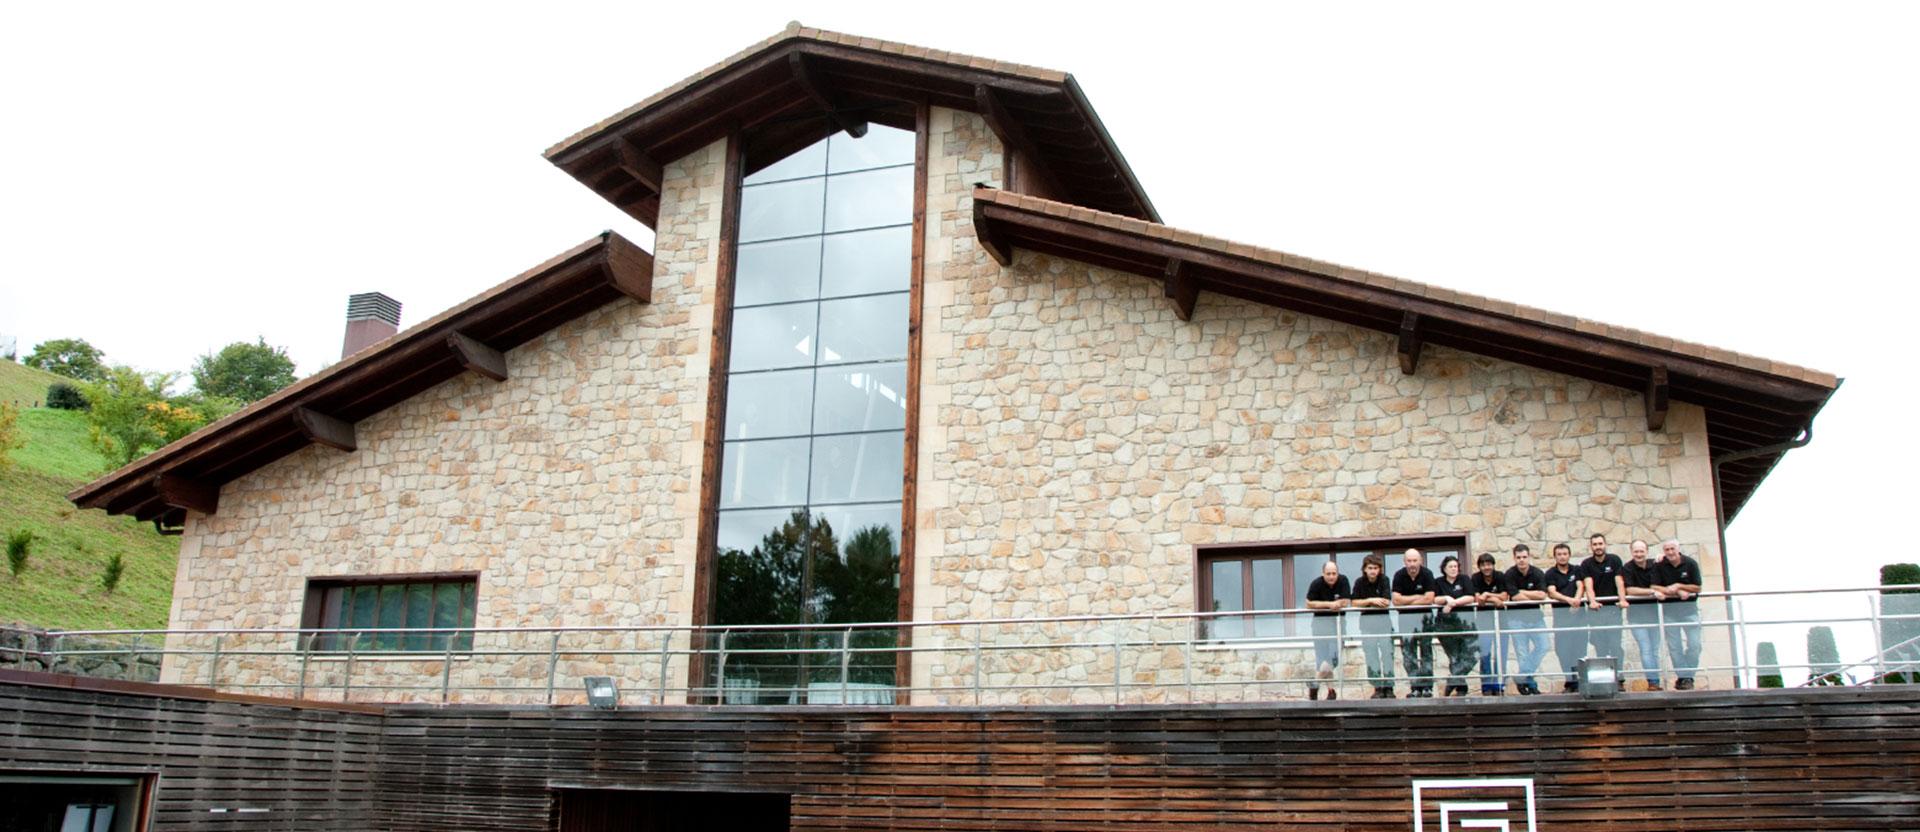 <h1>Gorka Izagirre winery</h1>